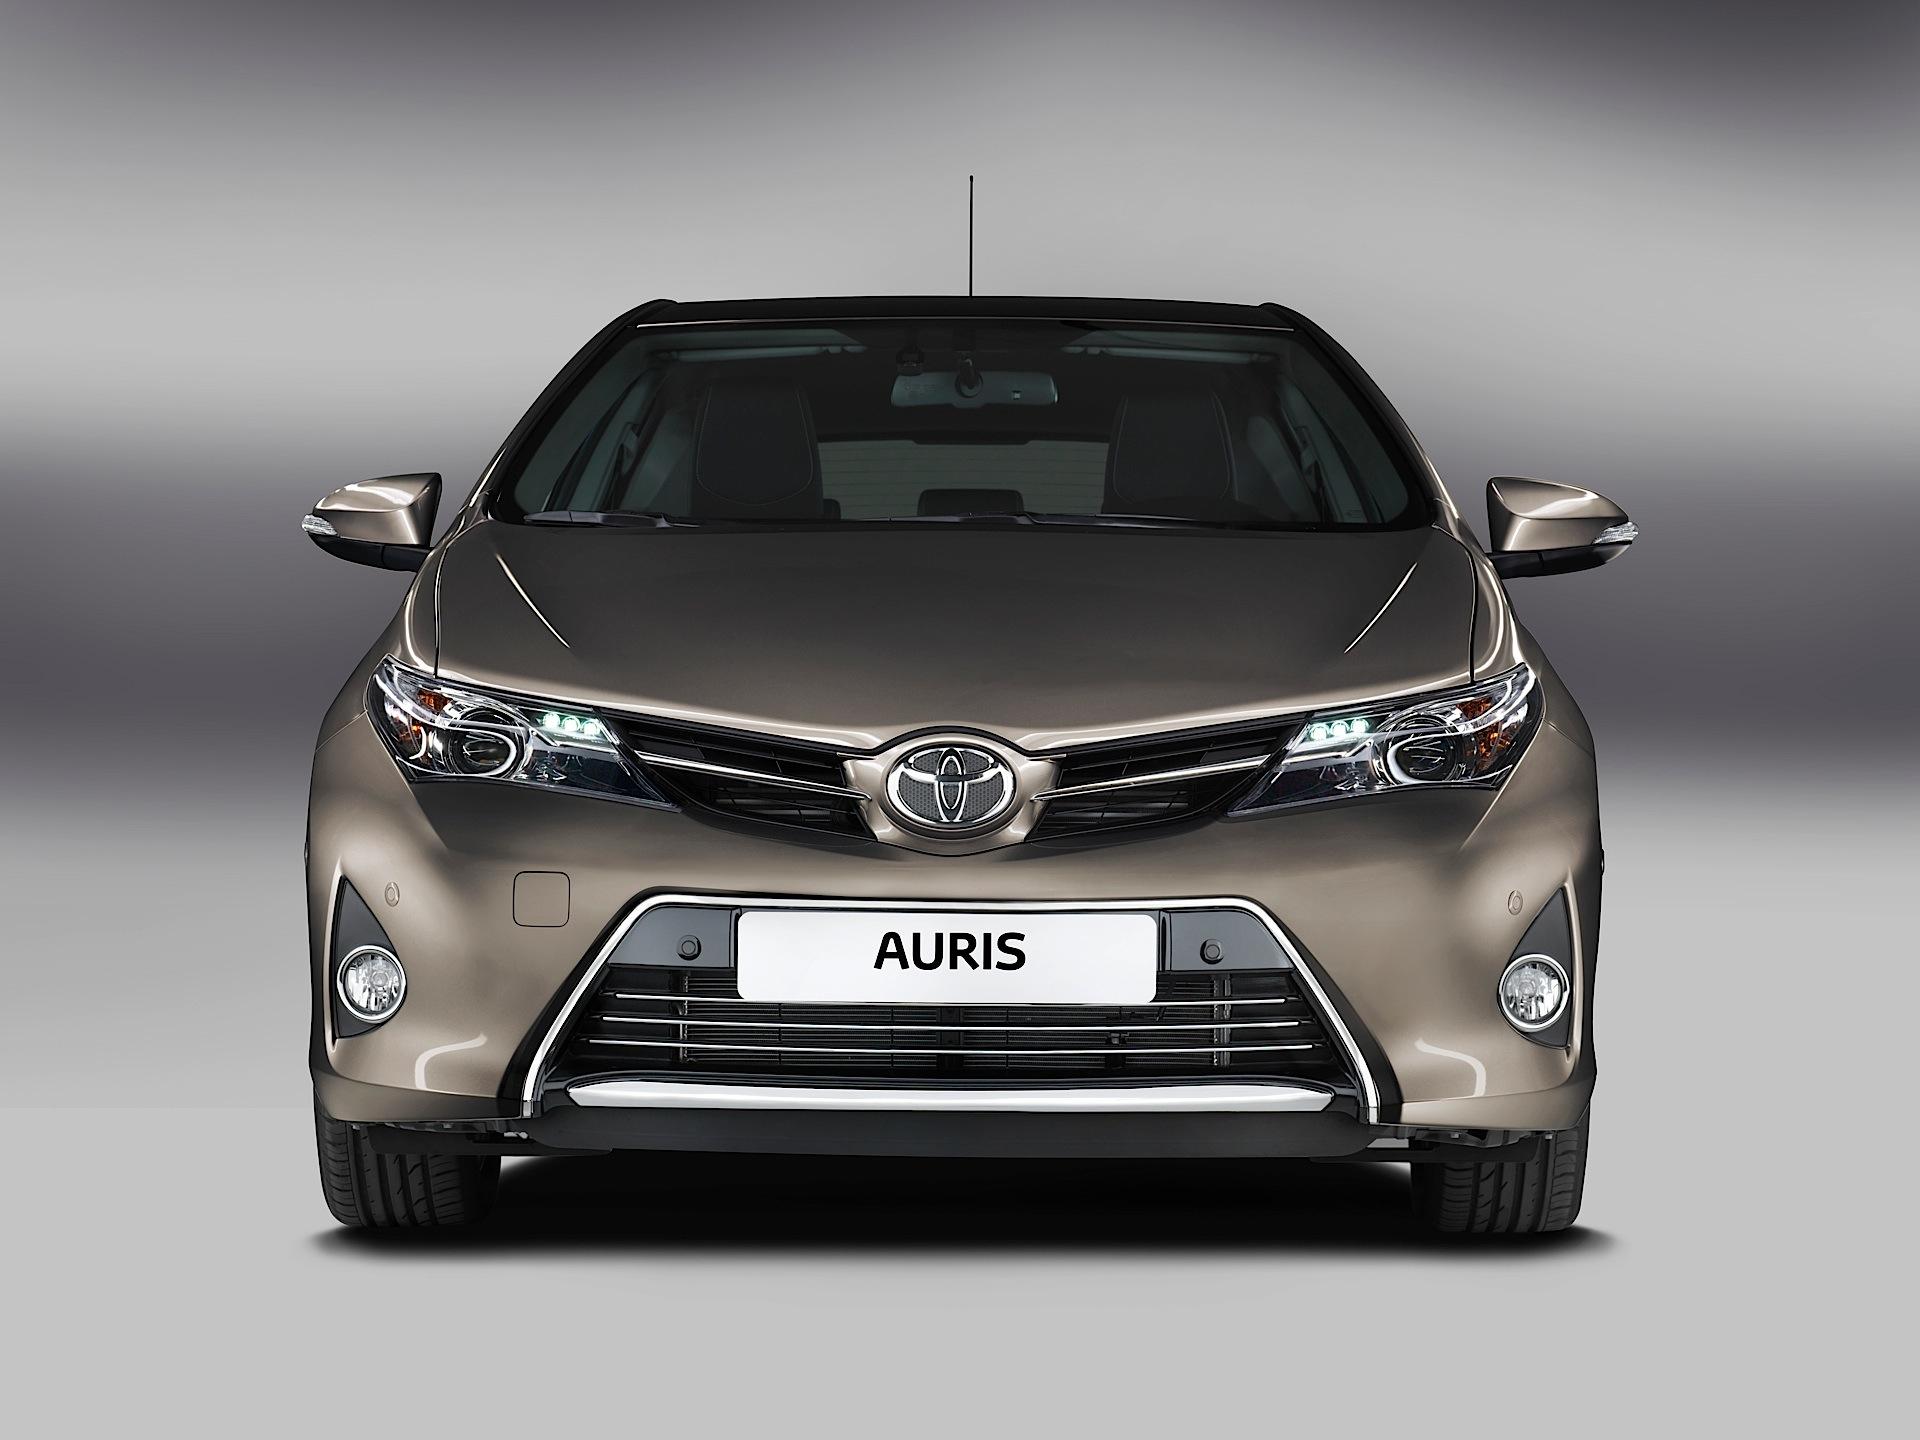 toyota auris 5 doors specs - 2013, 2014, 2015 - autoevolution